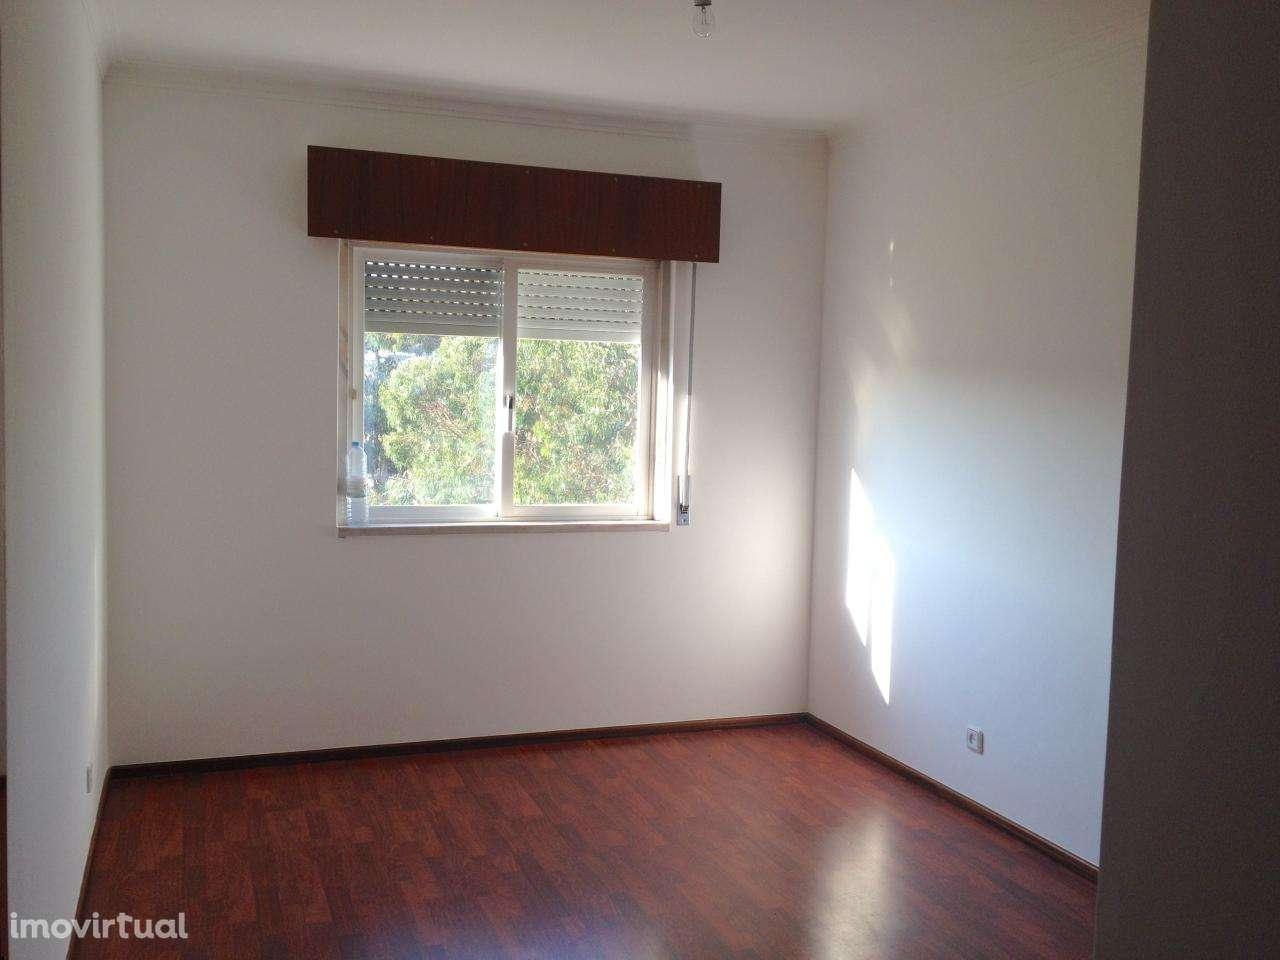 Apartamento para comprar, Rio de Mouro, Lisboa - Foto 22